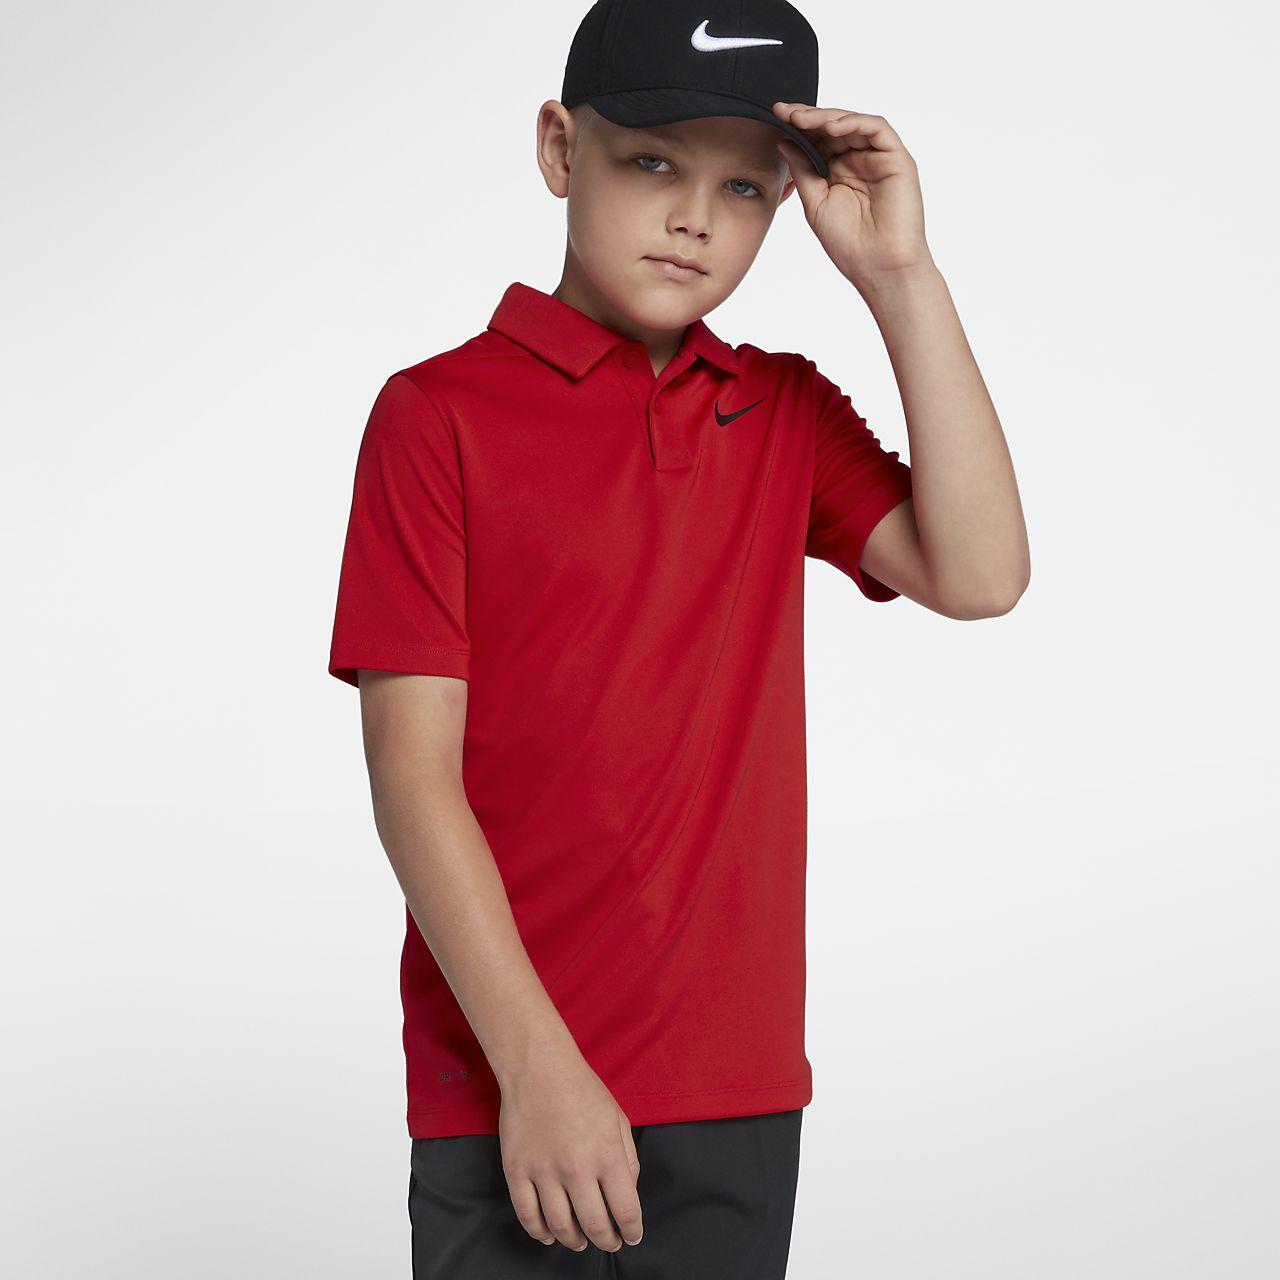 Nike Dri-FIT Victory Older Kids' (Boys') Golf Polo